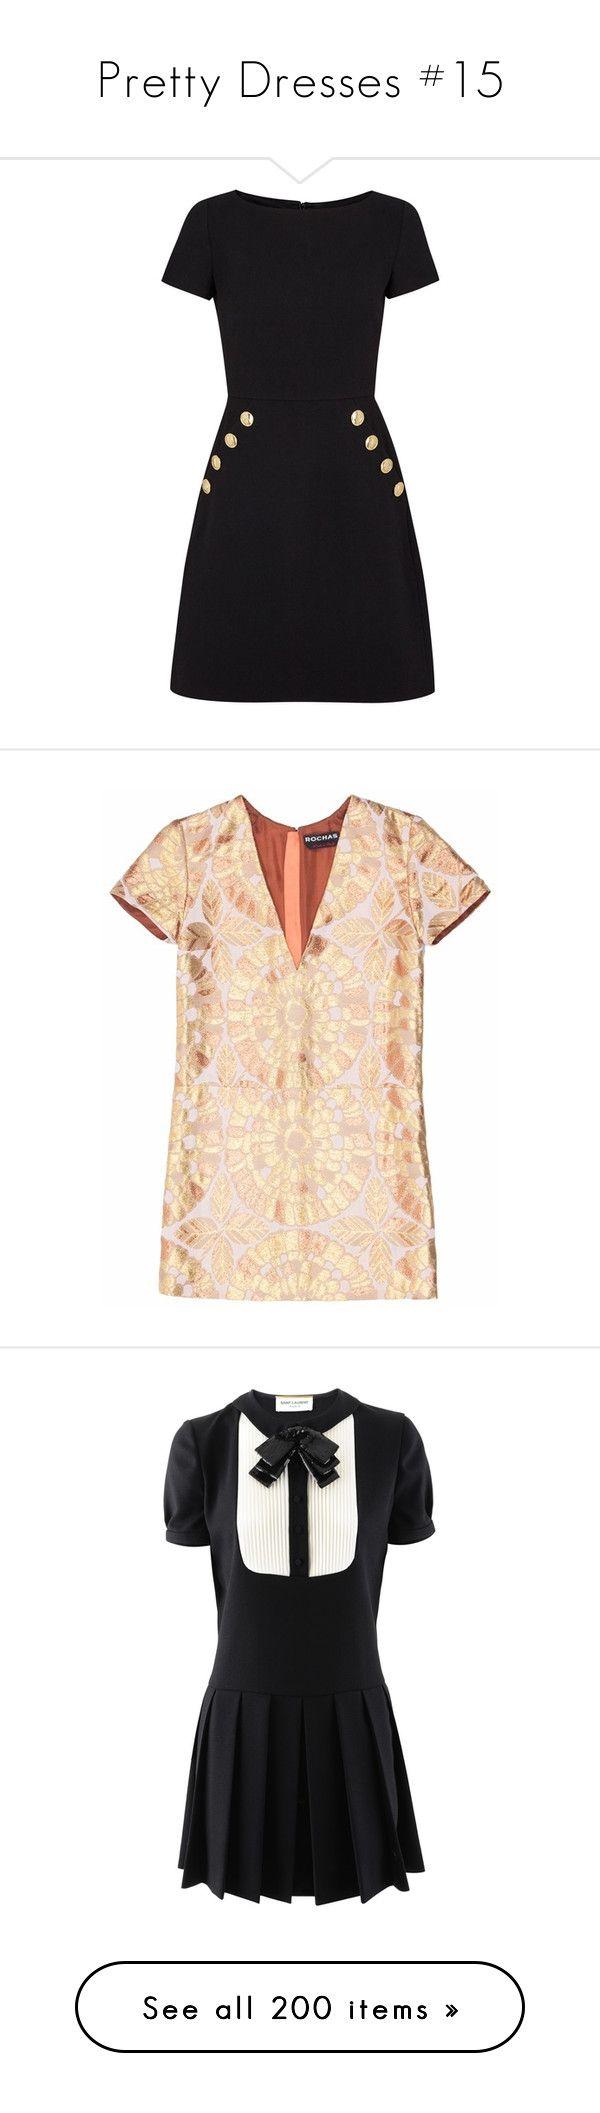 """Pretty Dresses #15"" by emma-oloughlin ❤ liked on Polyvore featuring dresses, vestidos, black zipper dress, wool dress, black dress, black embellished dress, black wool dress, tops, beige cocktail dress and v neck mini dress"